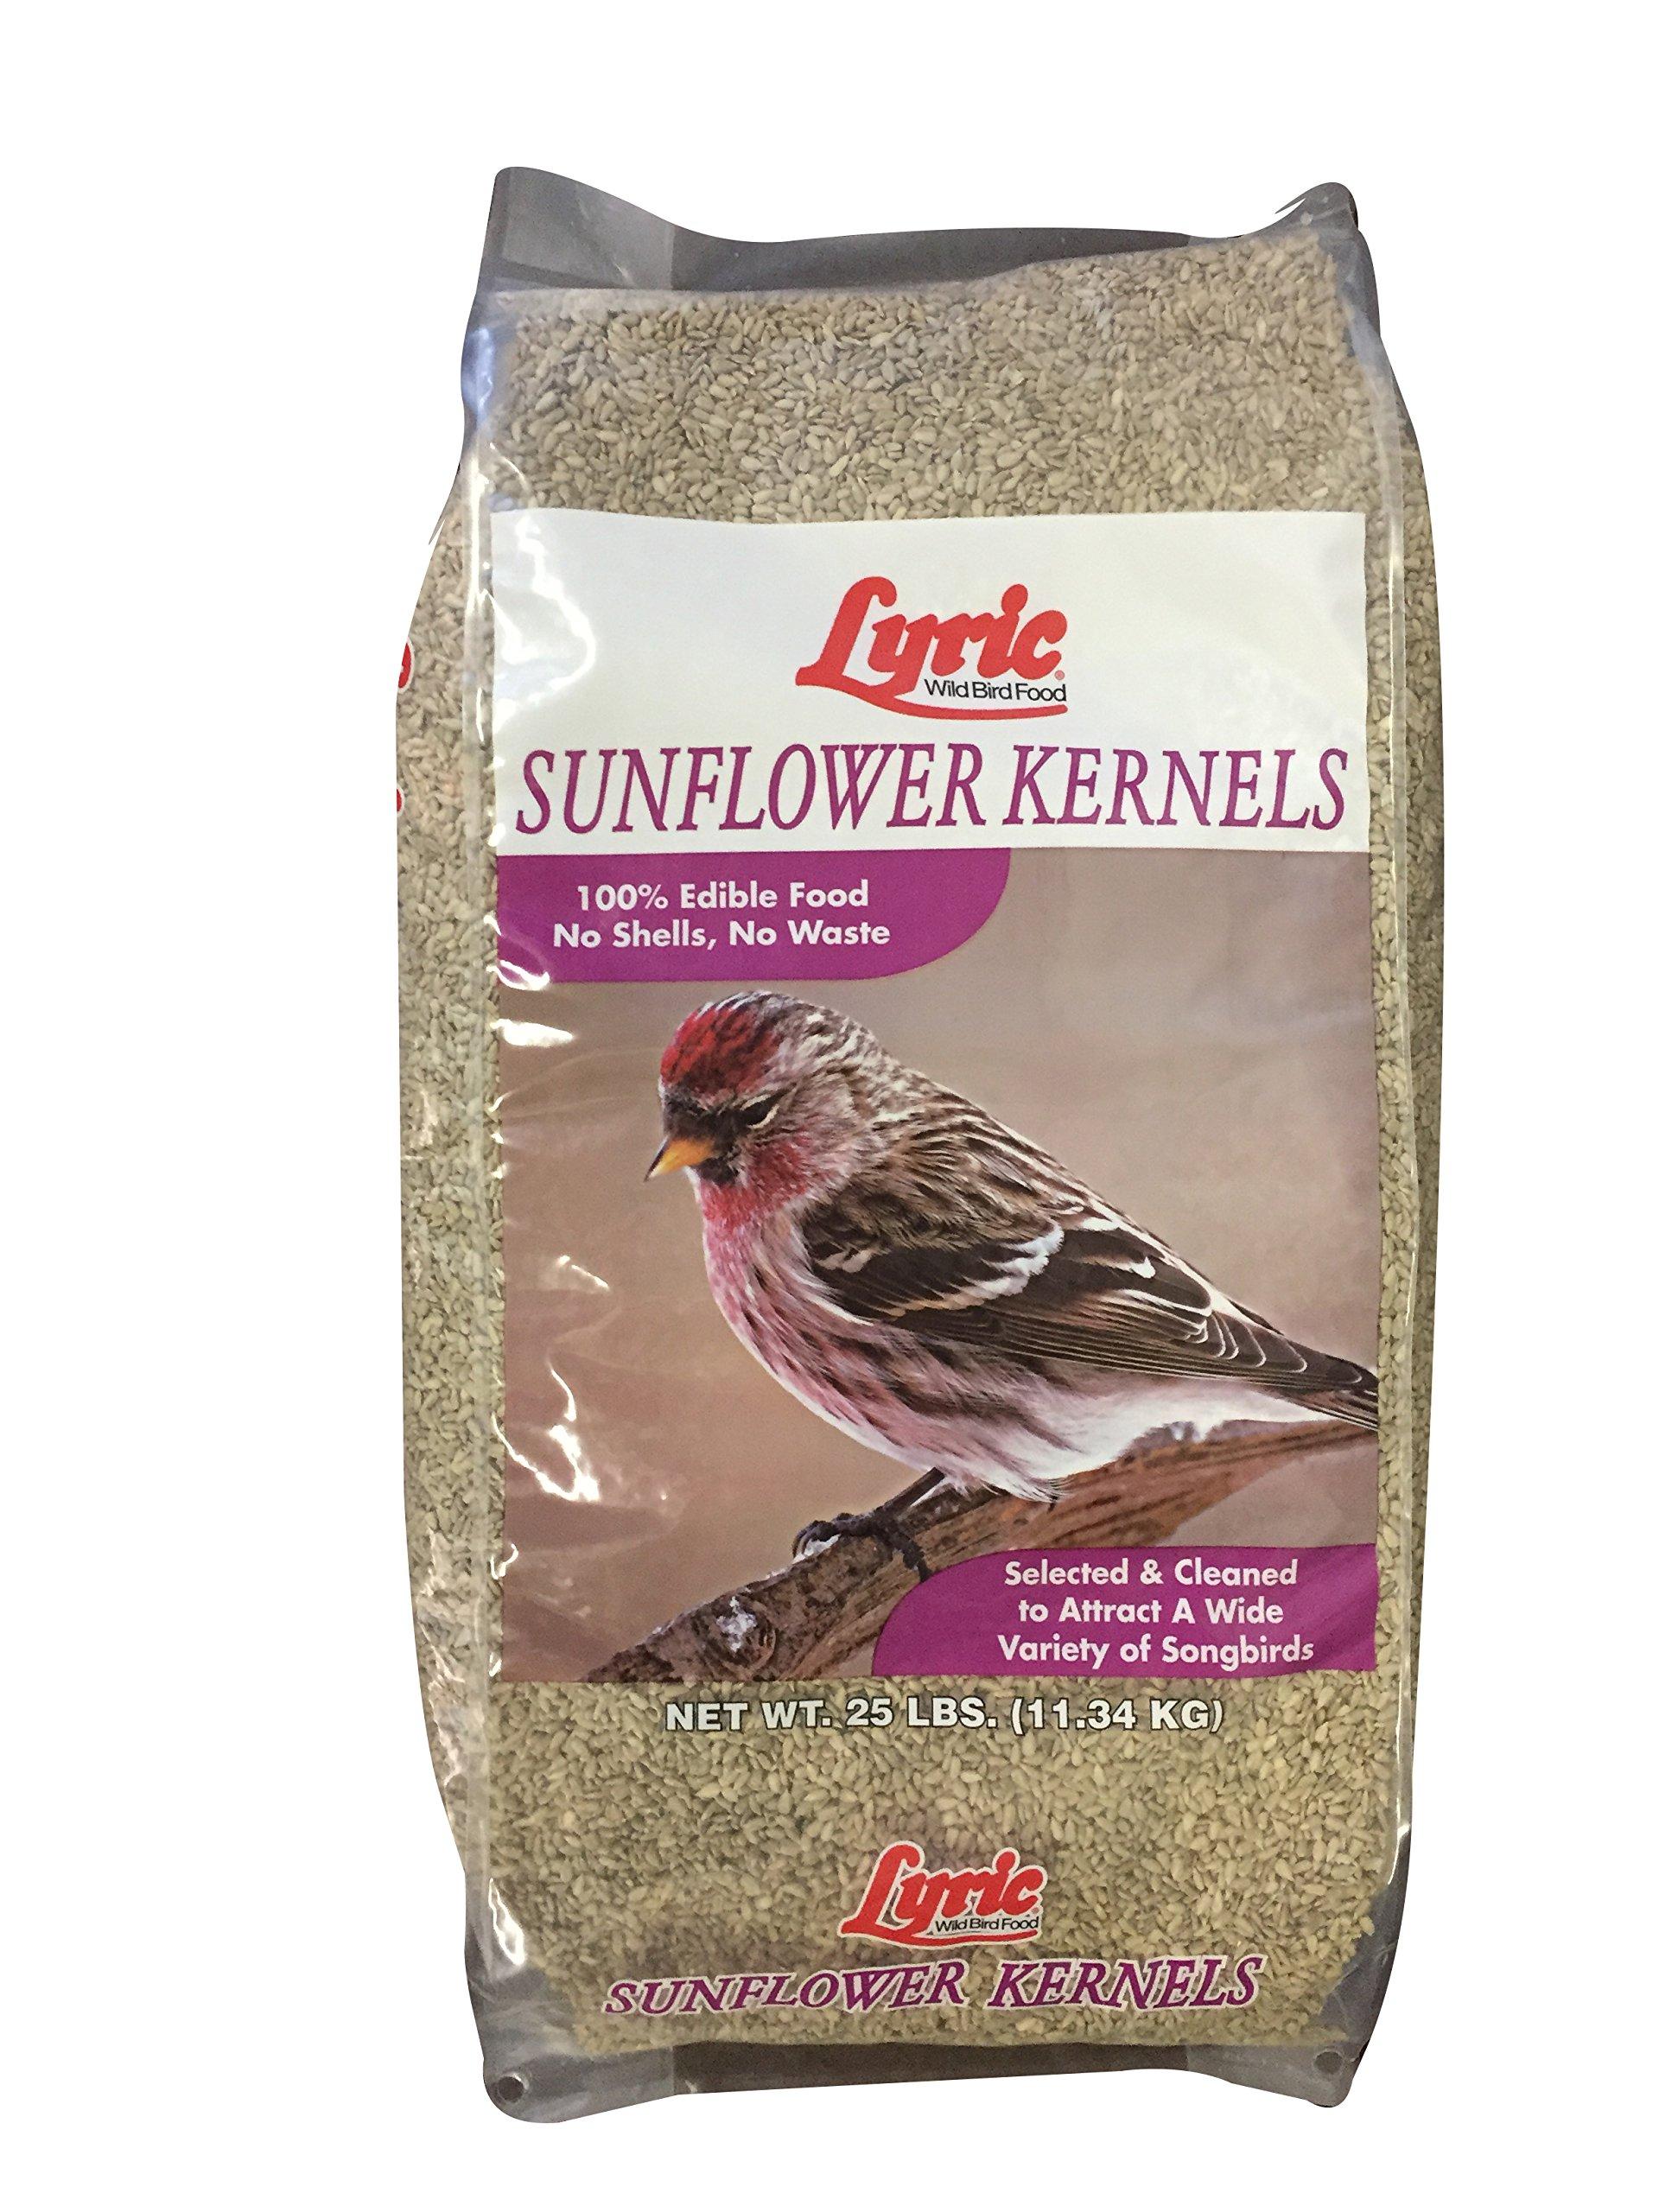 Lyric Sunflower Kernels - 25 lb. bag